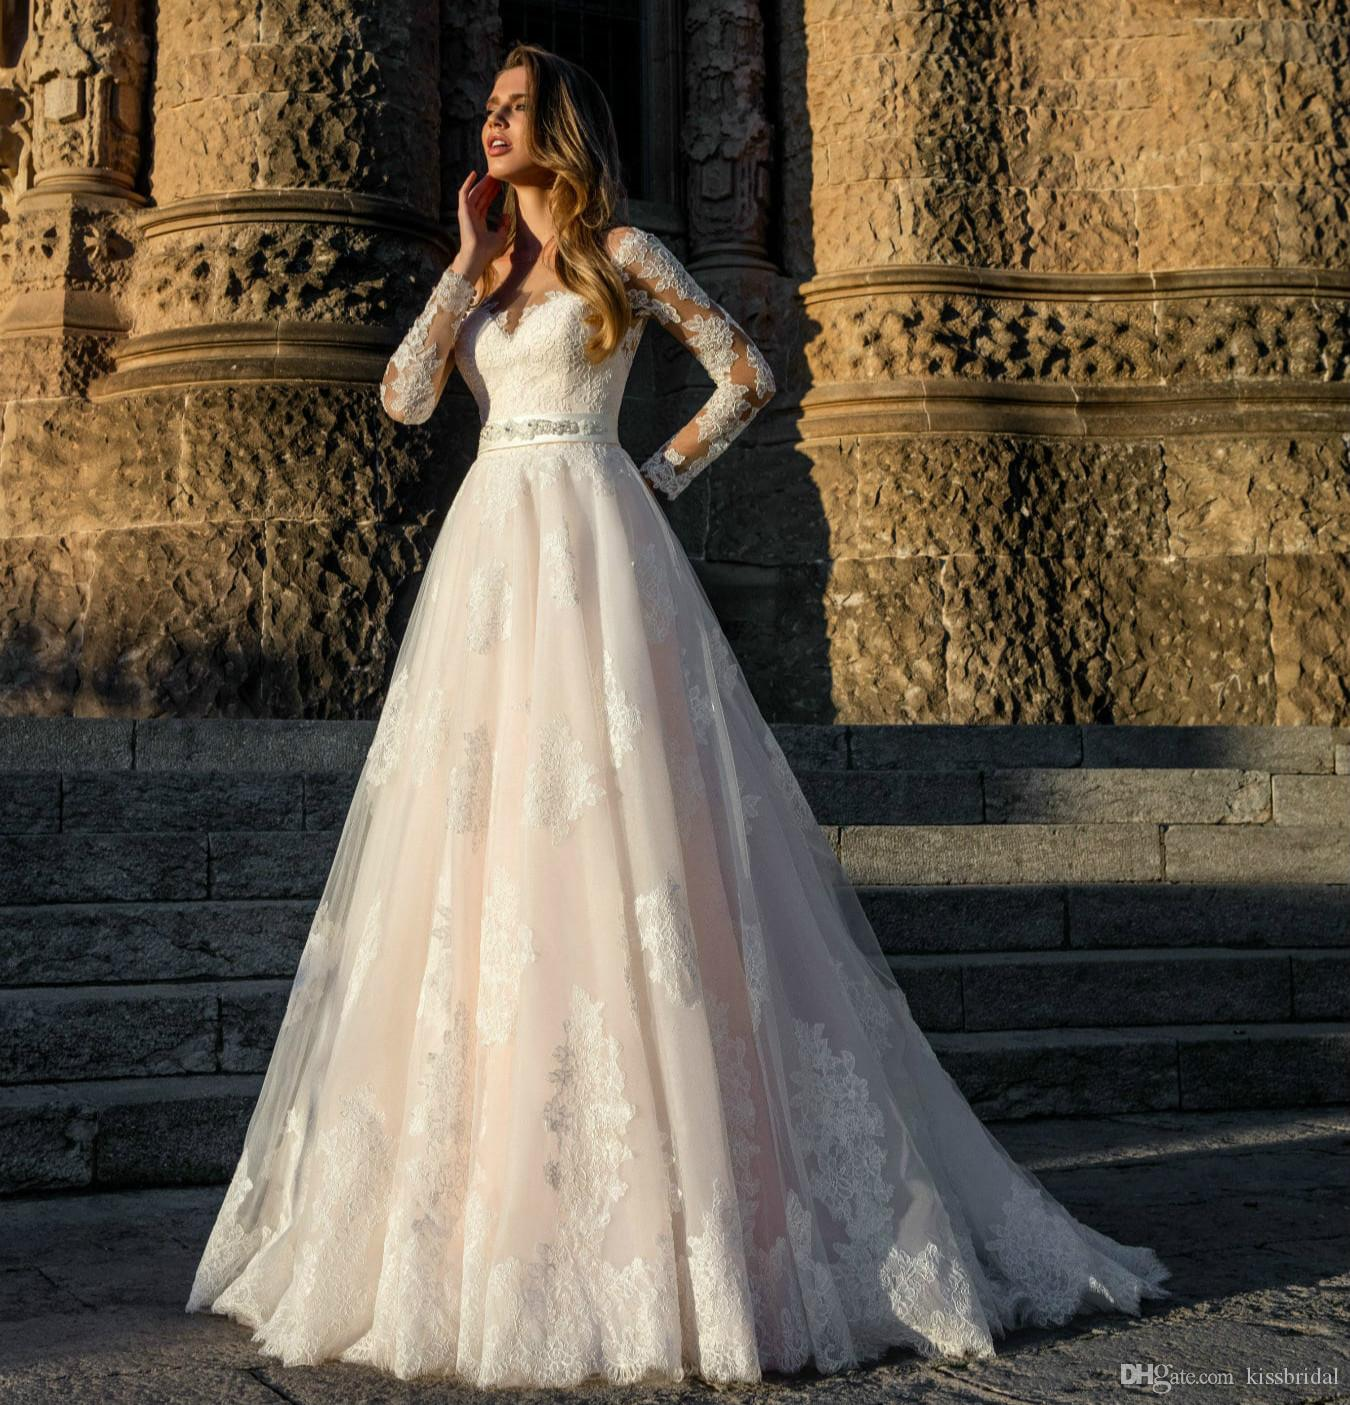 New Design Long Wedding Dress 2021 Bateau Neck Long Sleeves Chapel Train Appliques Tulle Bridal Gowns Vestido de noiva longo Robe de mariee